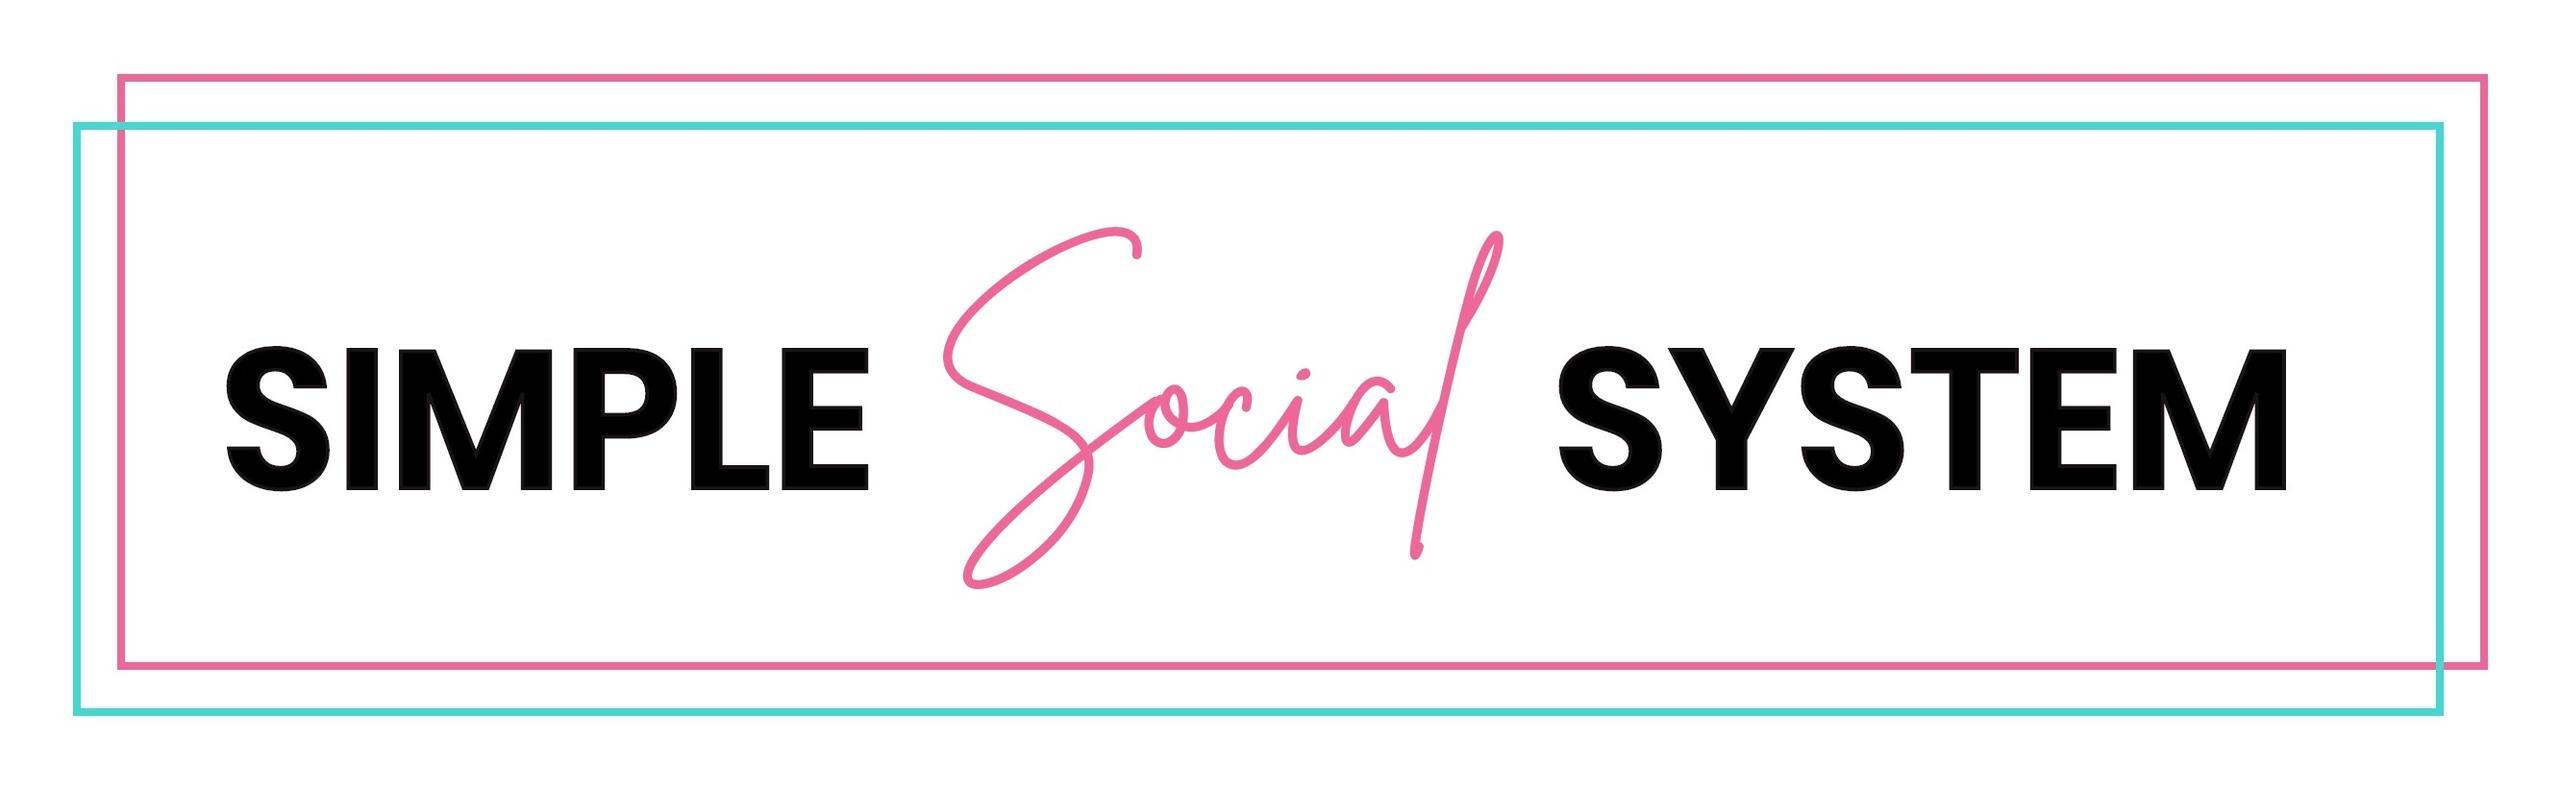 Simple Social System